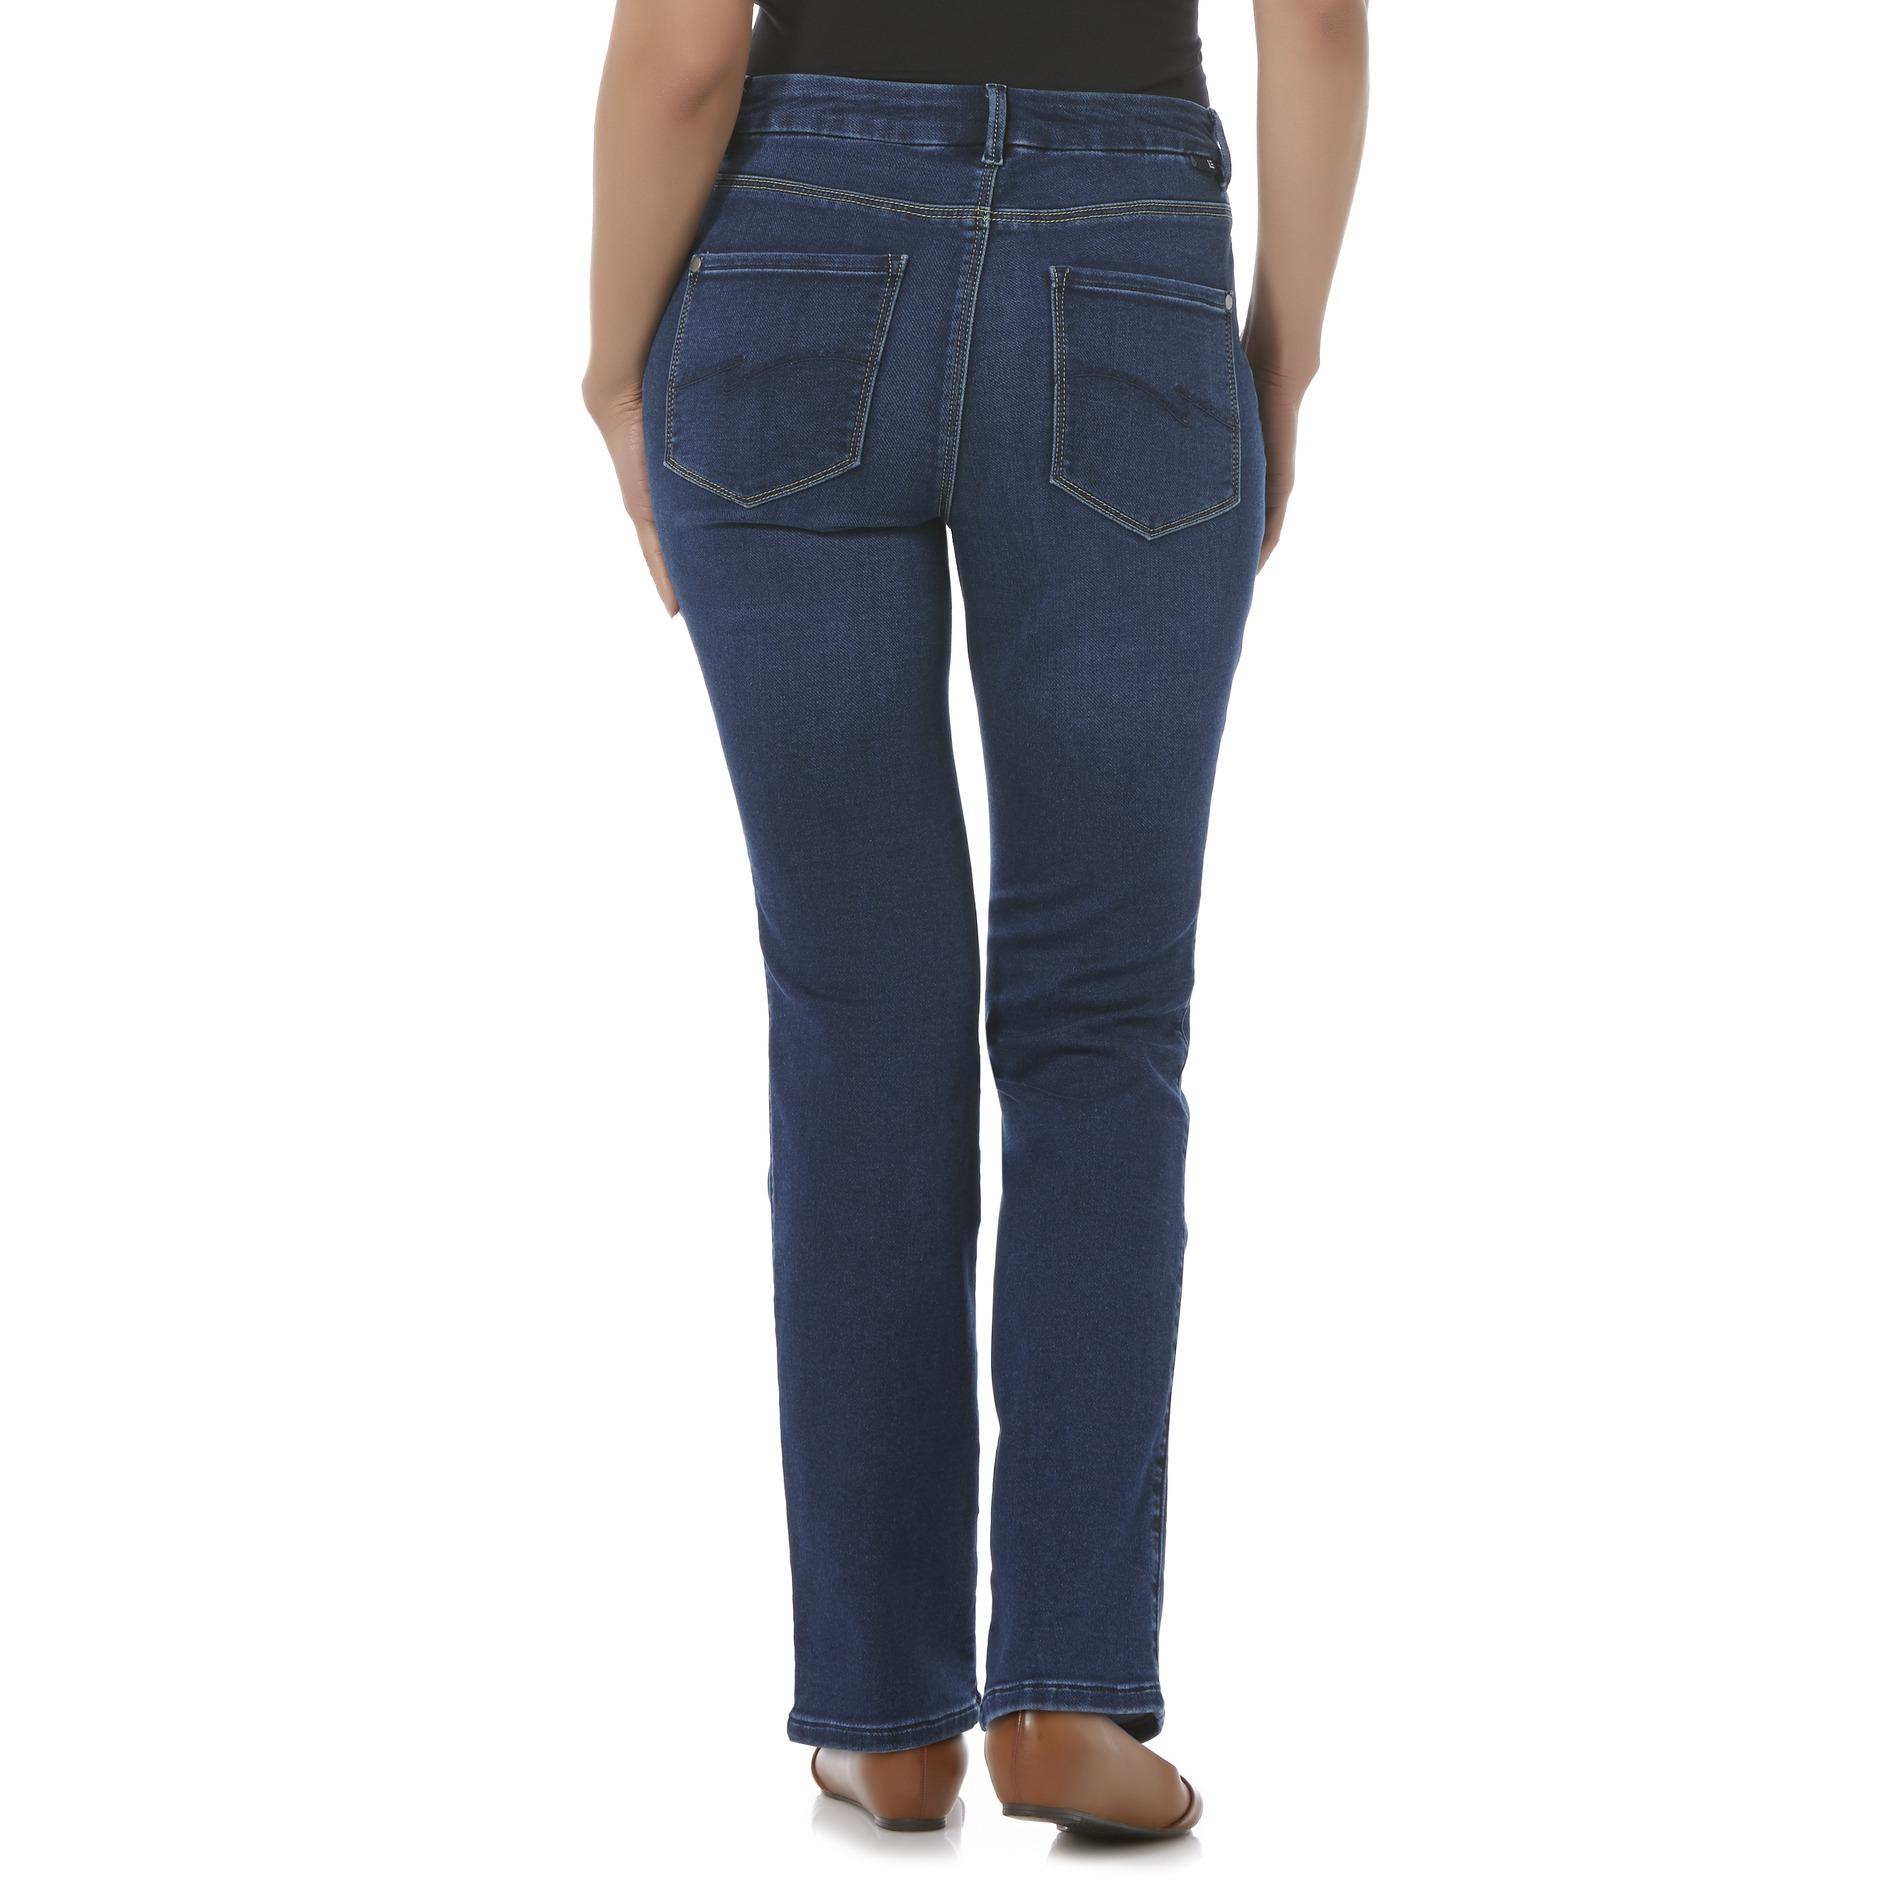 Lee Petite' Curvy Fit Jeans